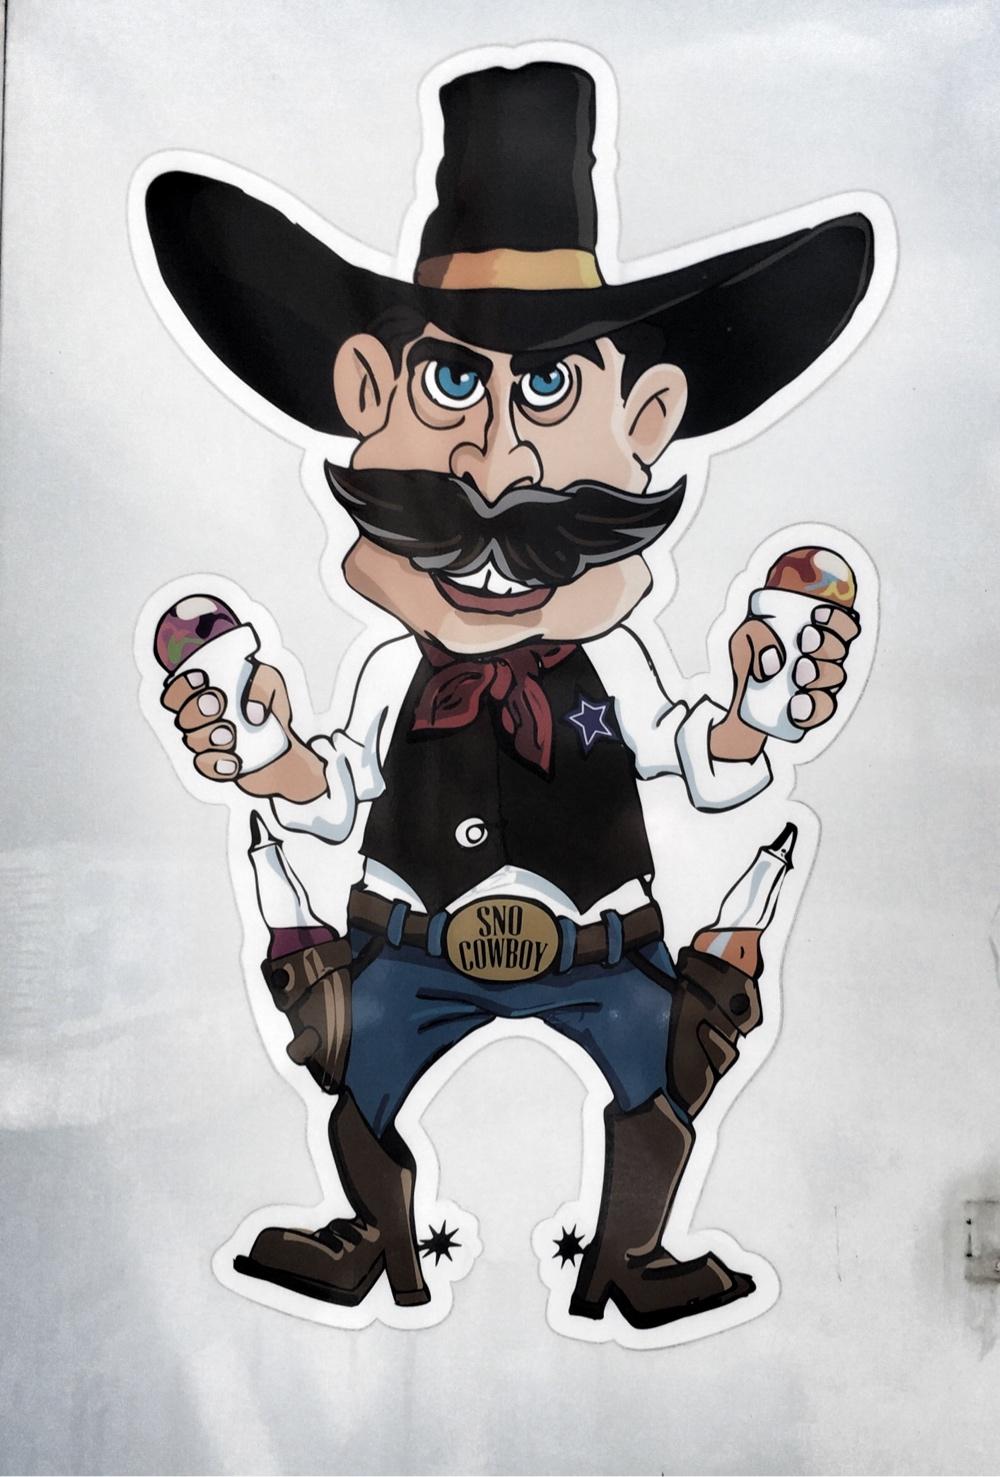 Son Cowboy